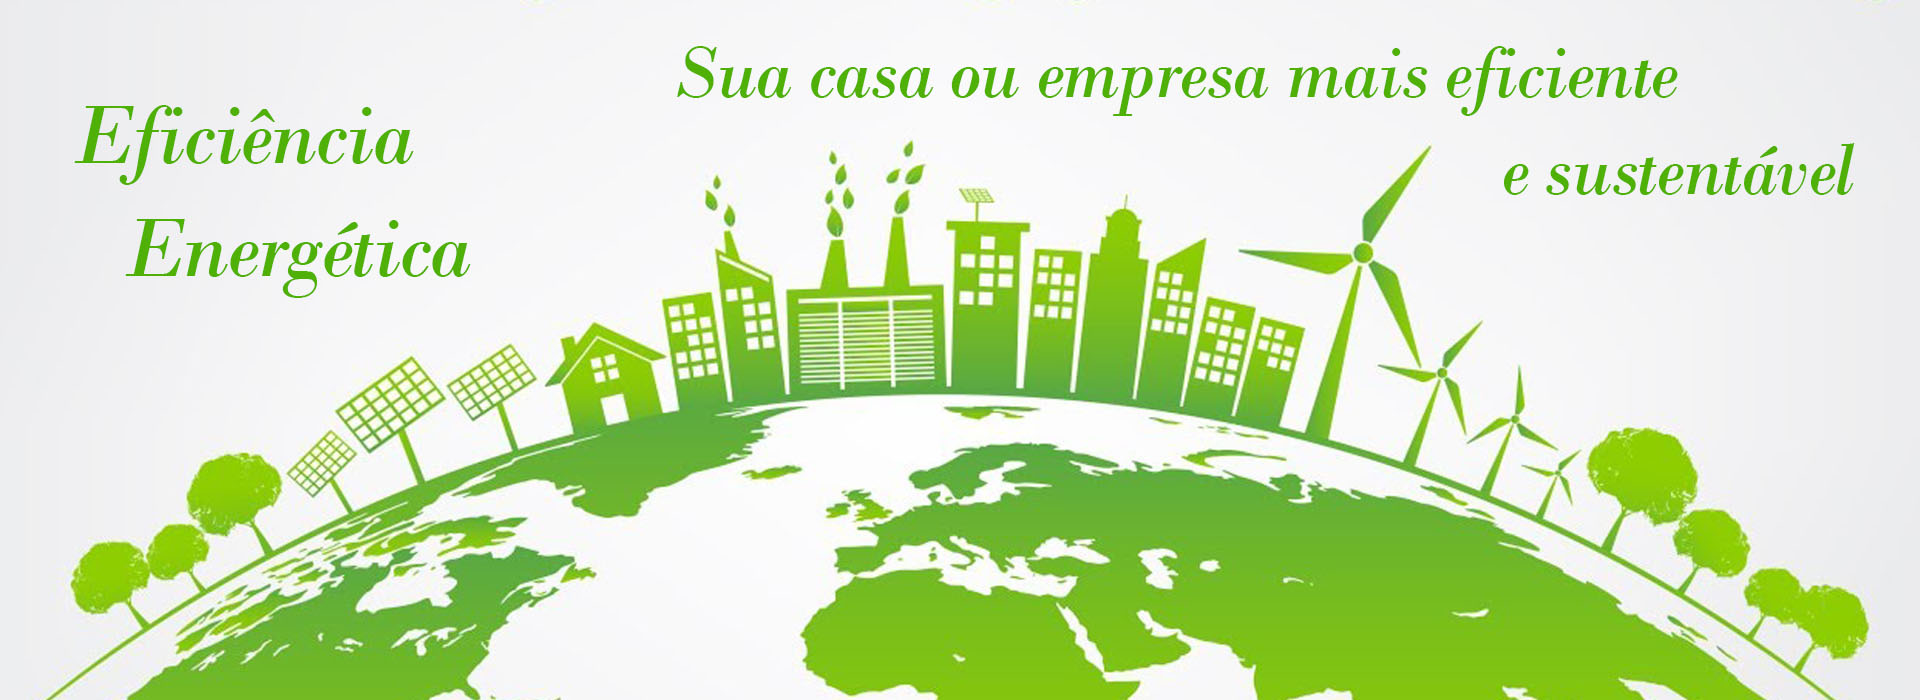 Eficiência Energética - Reconluz Salvador Bahia